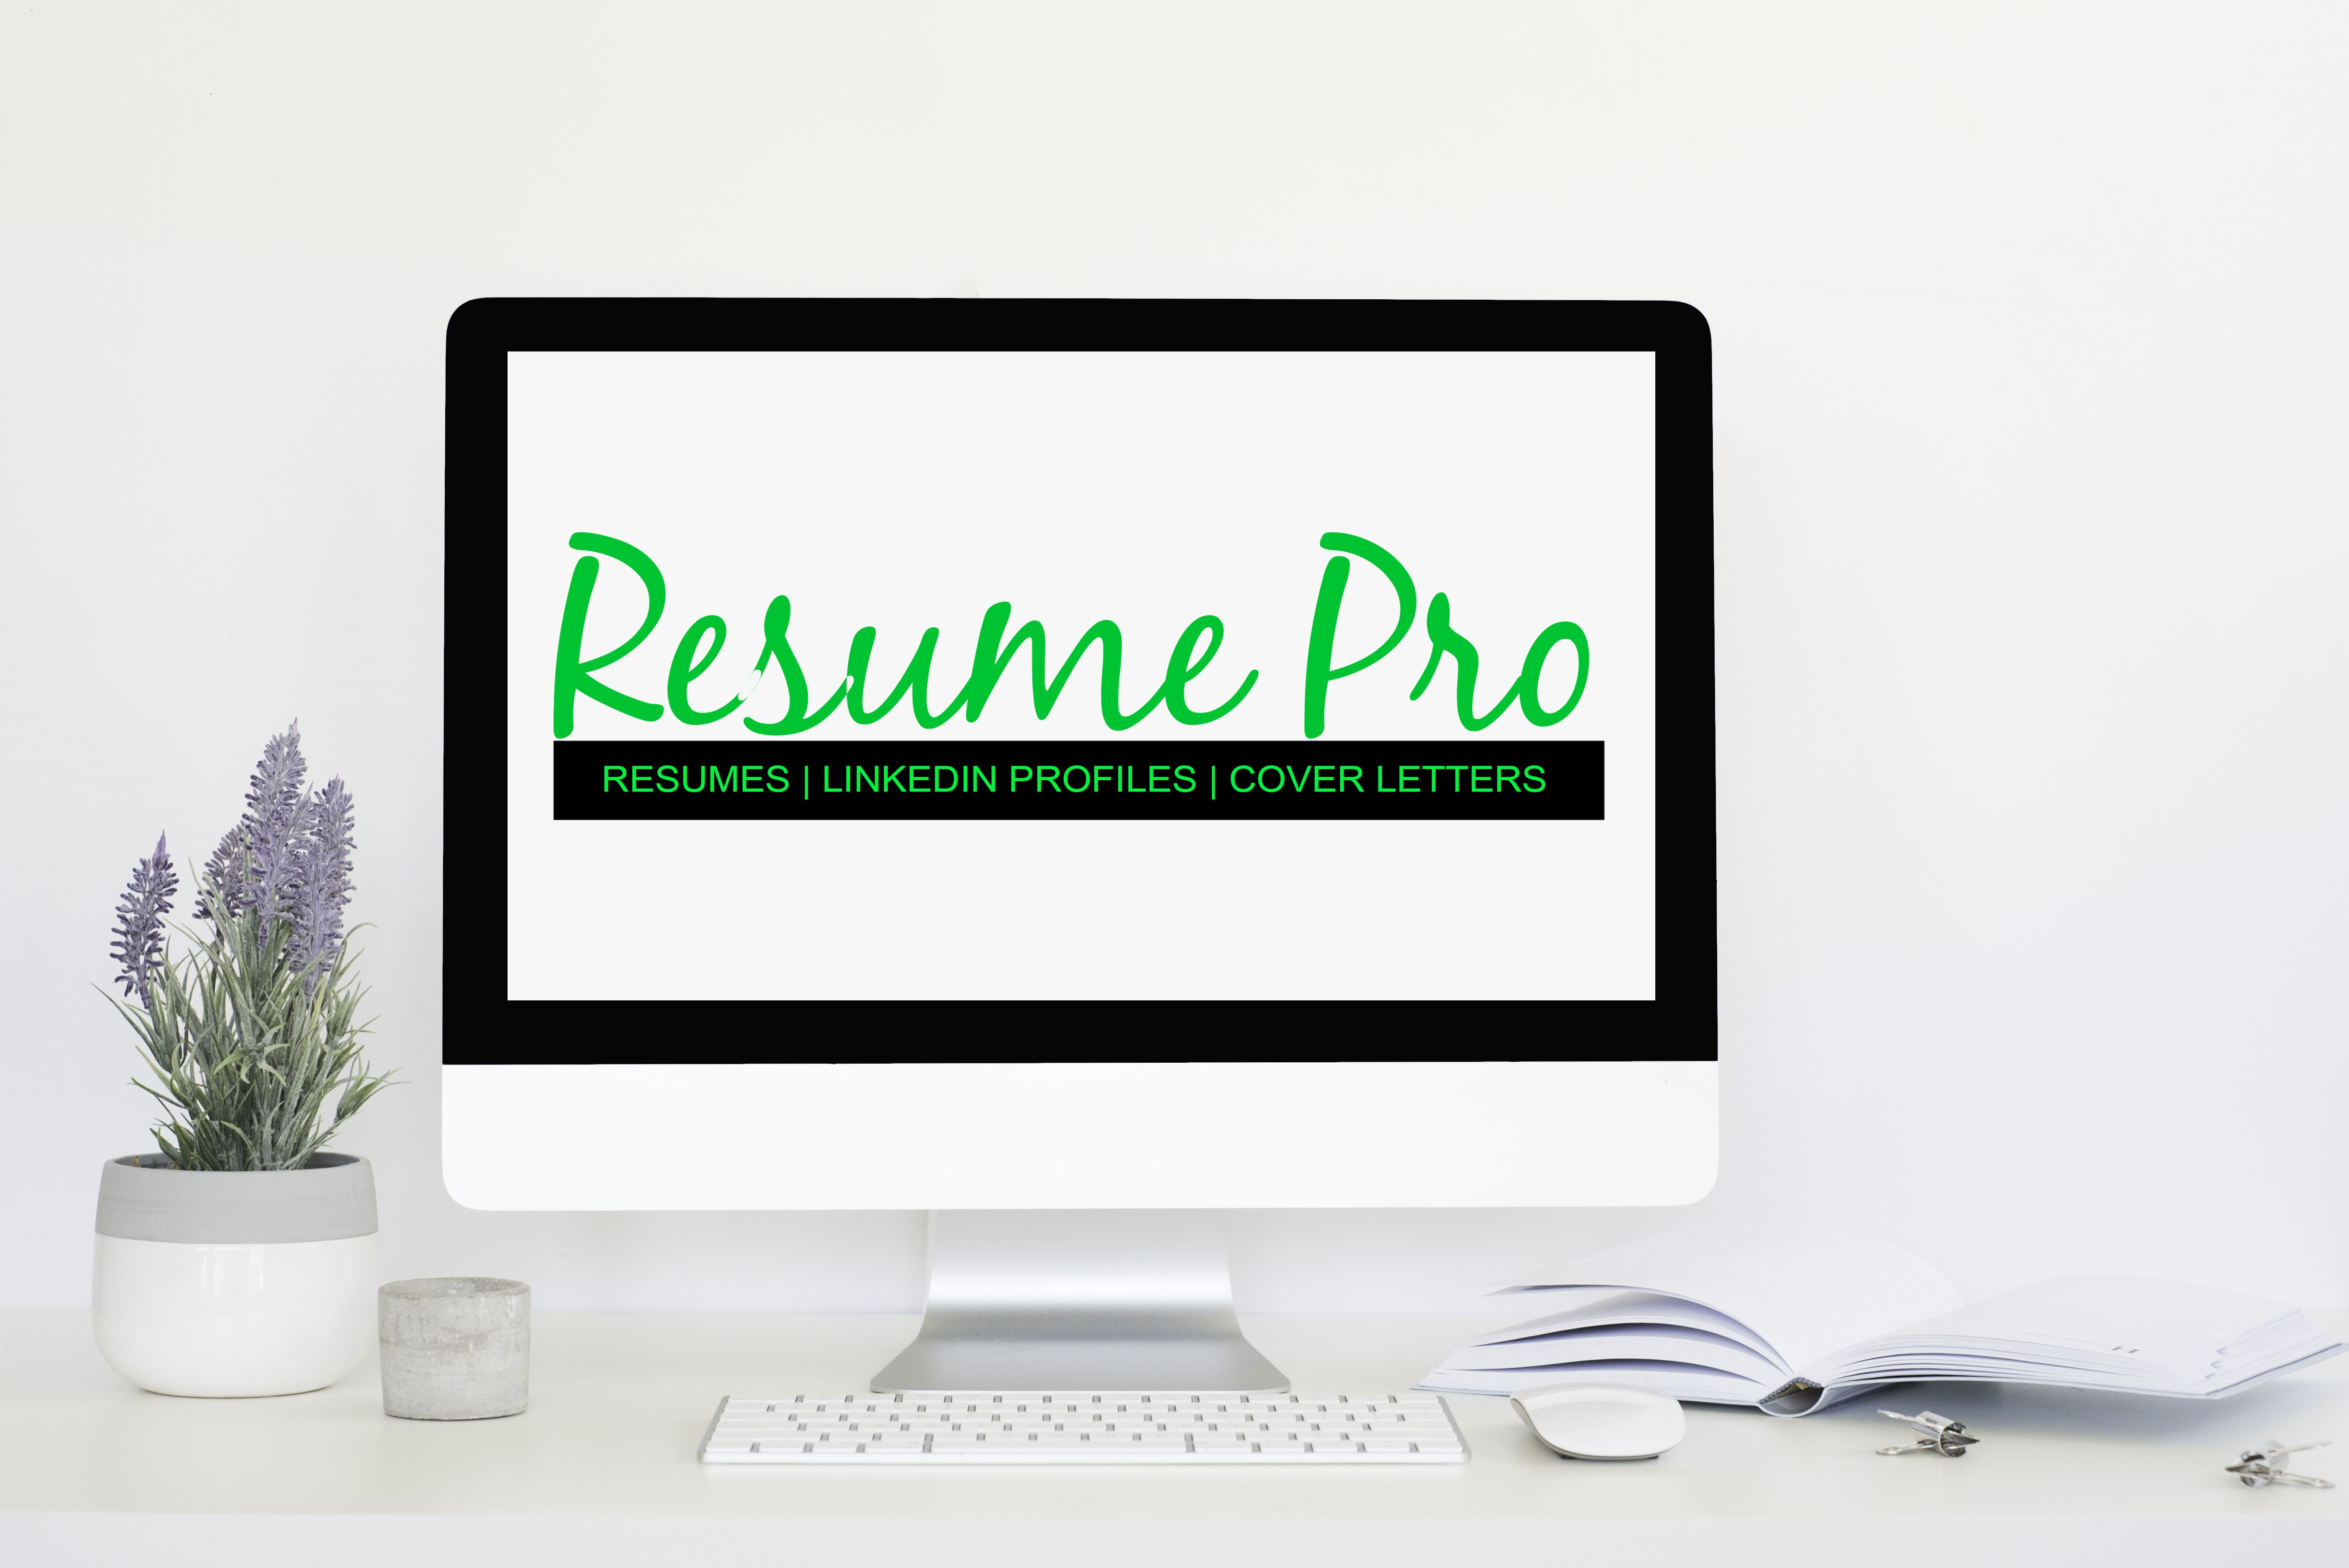 Resume Writing Service Resume Pro Jacksonville